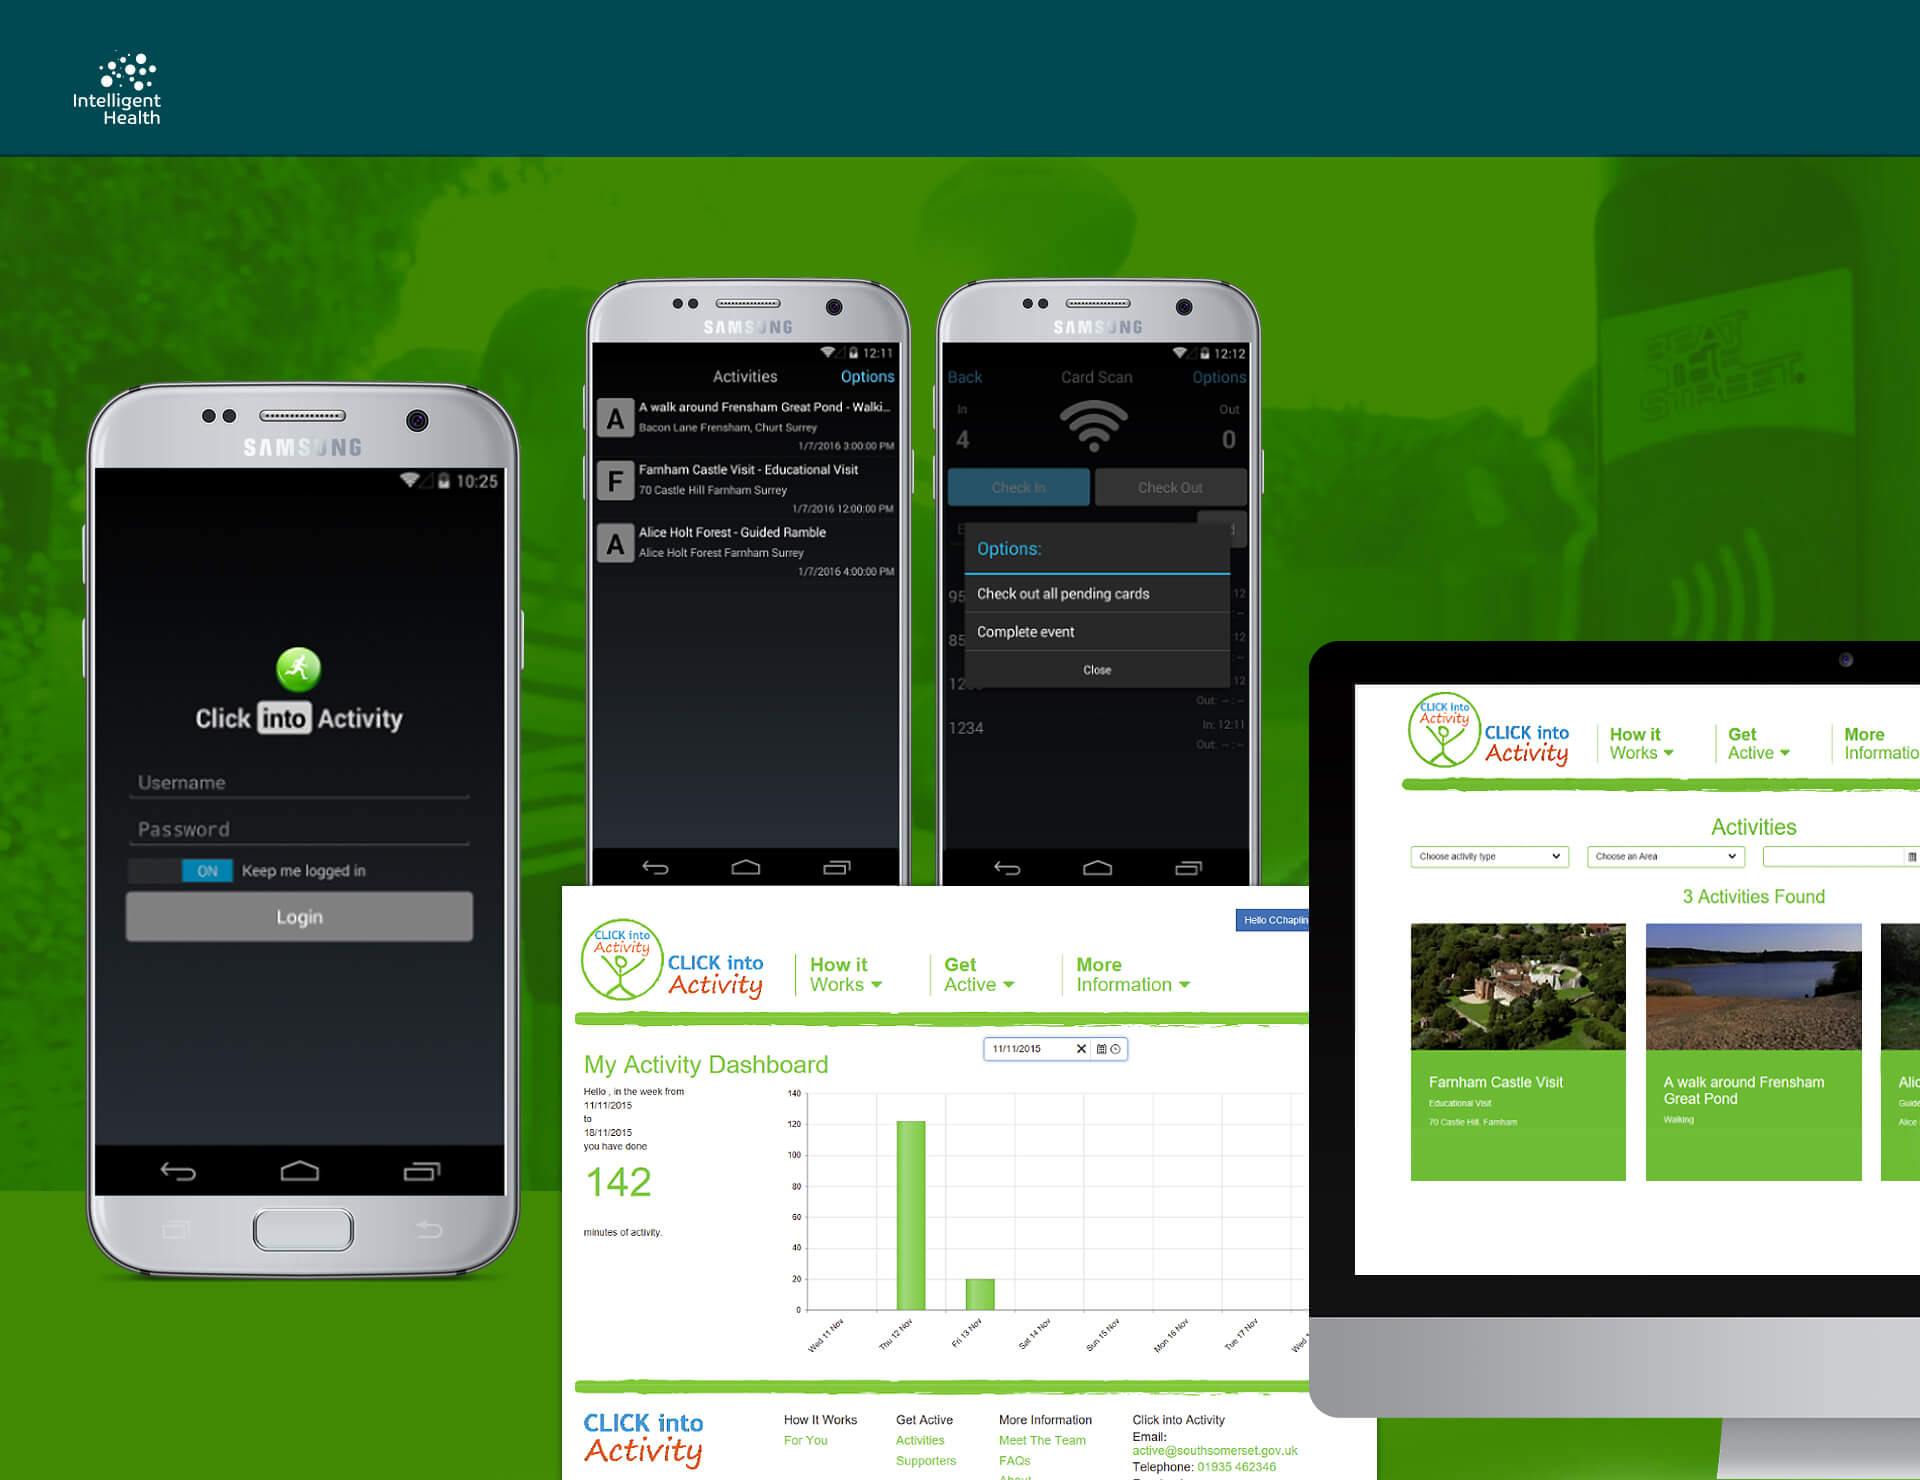 Intelligent Health - RFID Solution and Smartphone App